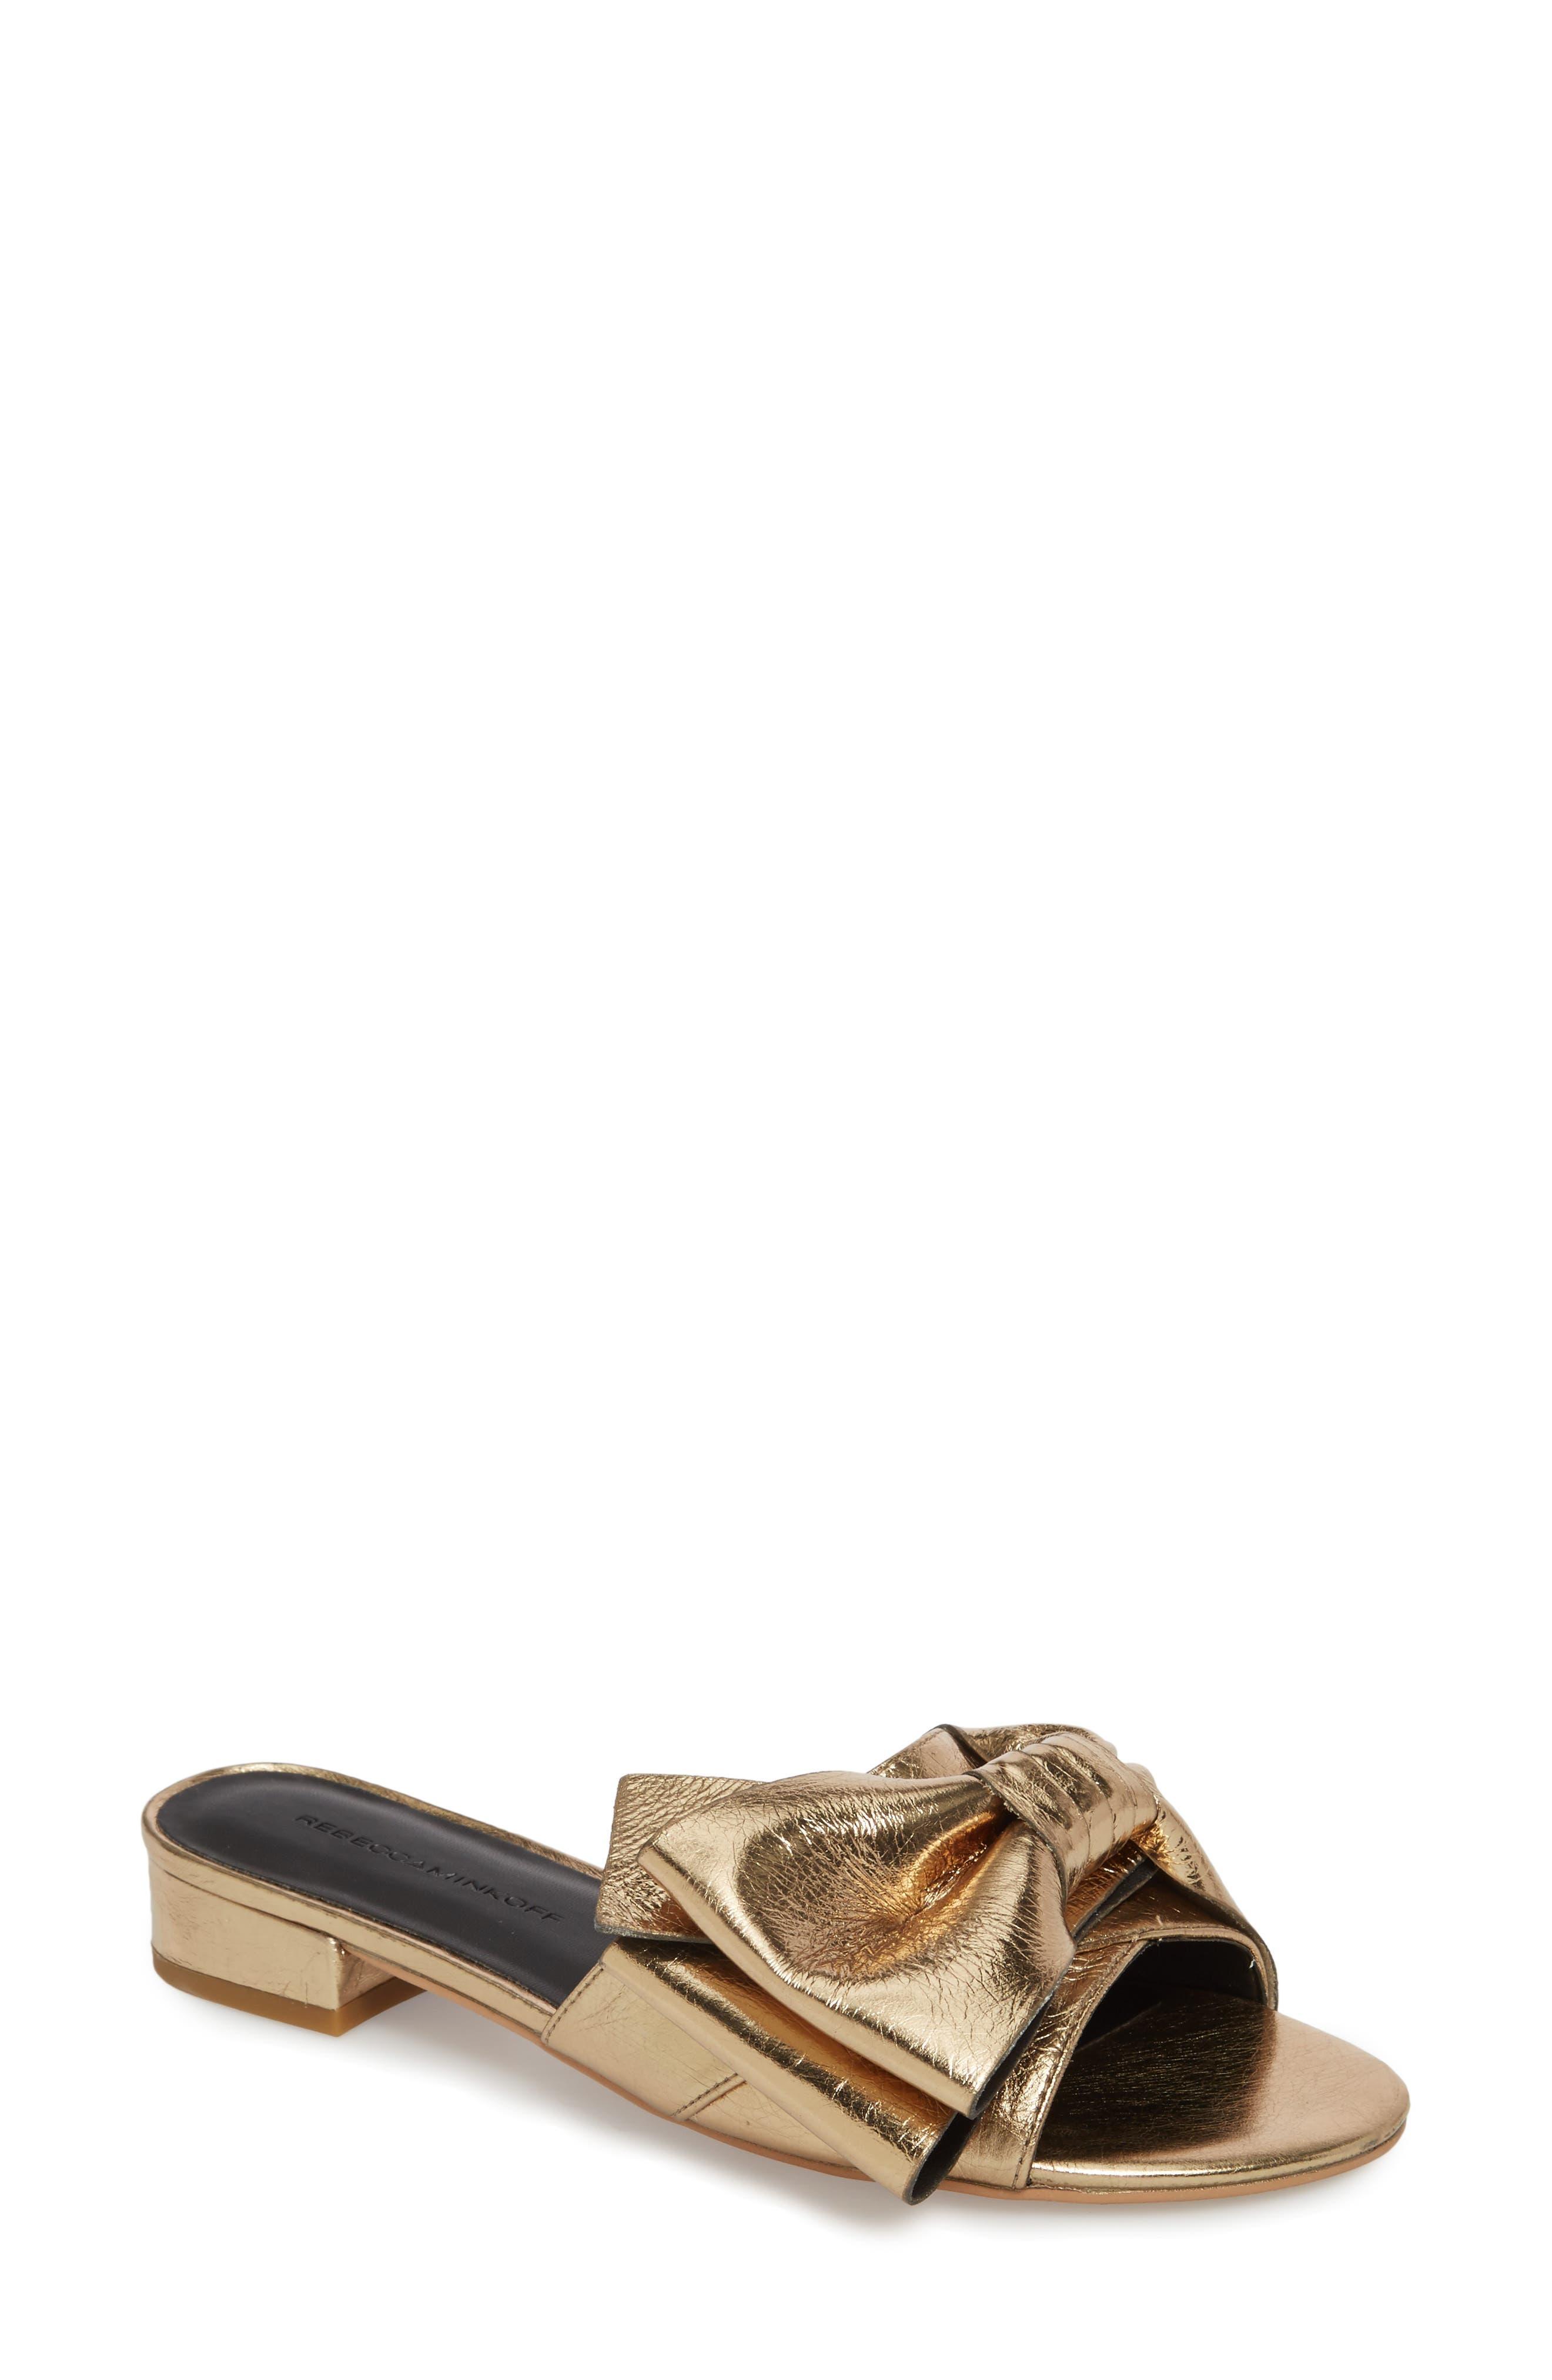 Calista Sandal,                         Main,                         color, Gold Metallic Leather